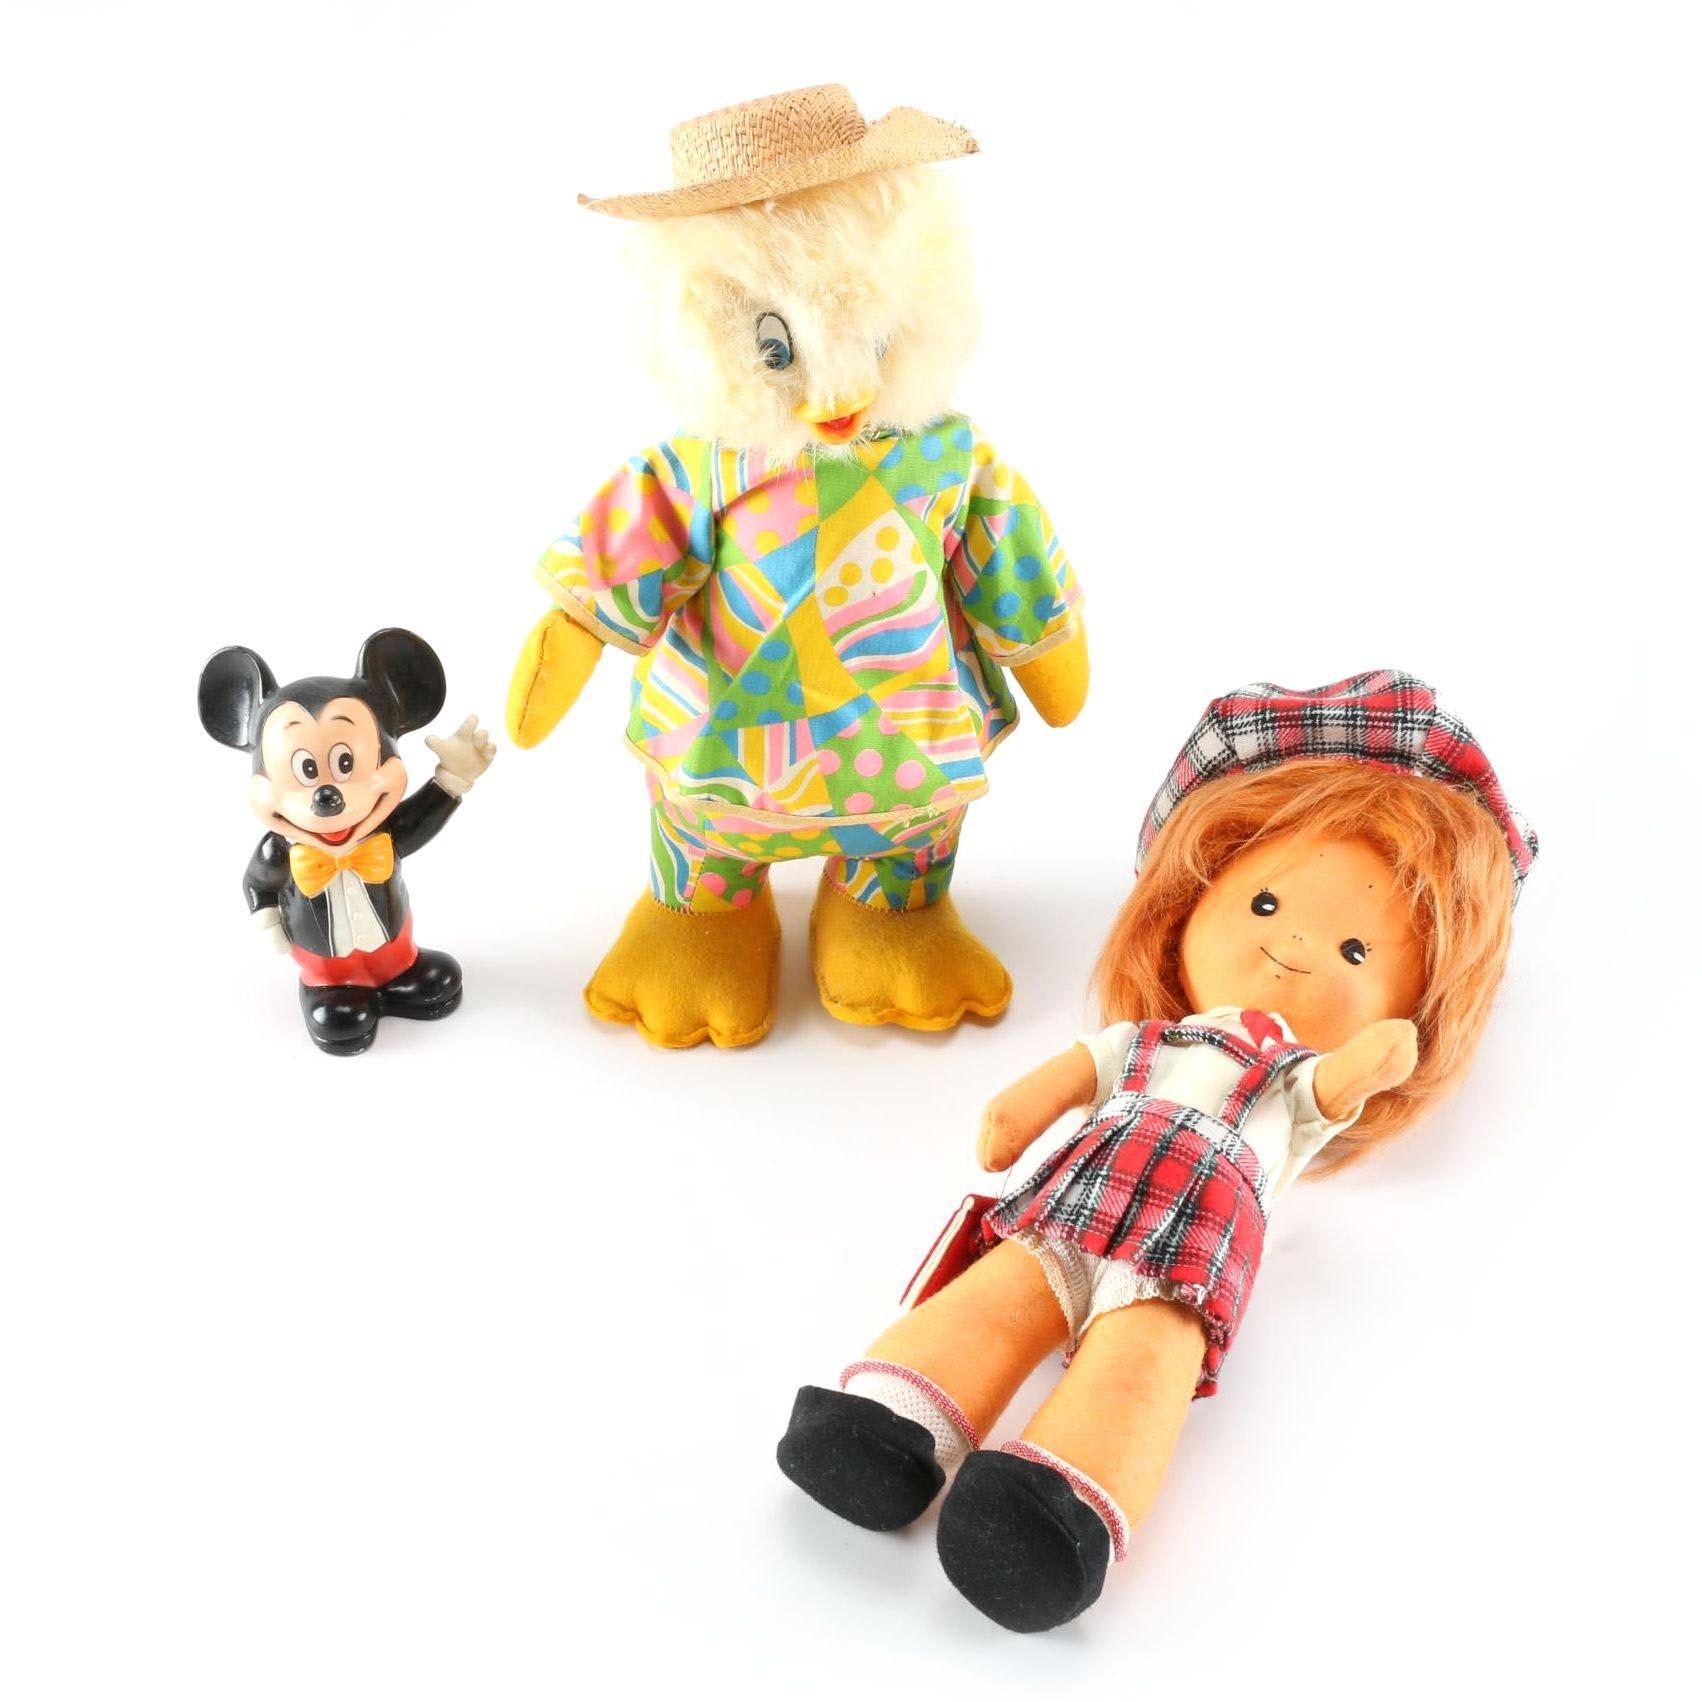 Mid 20th Century Toys